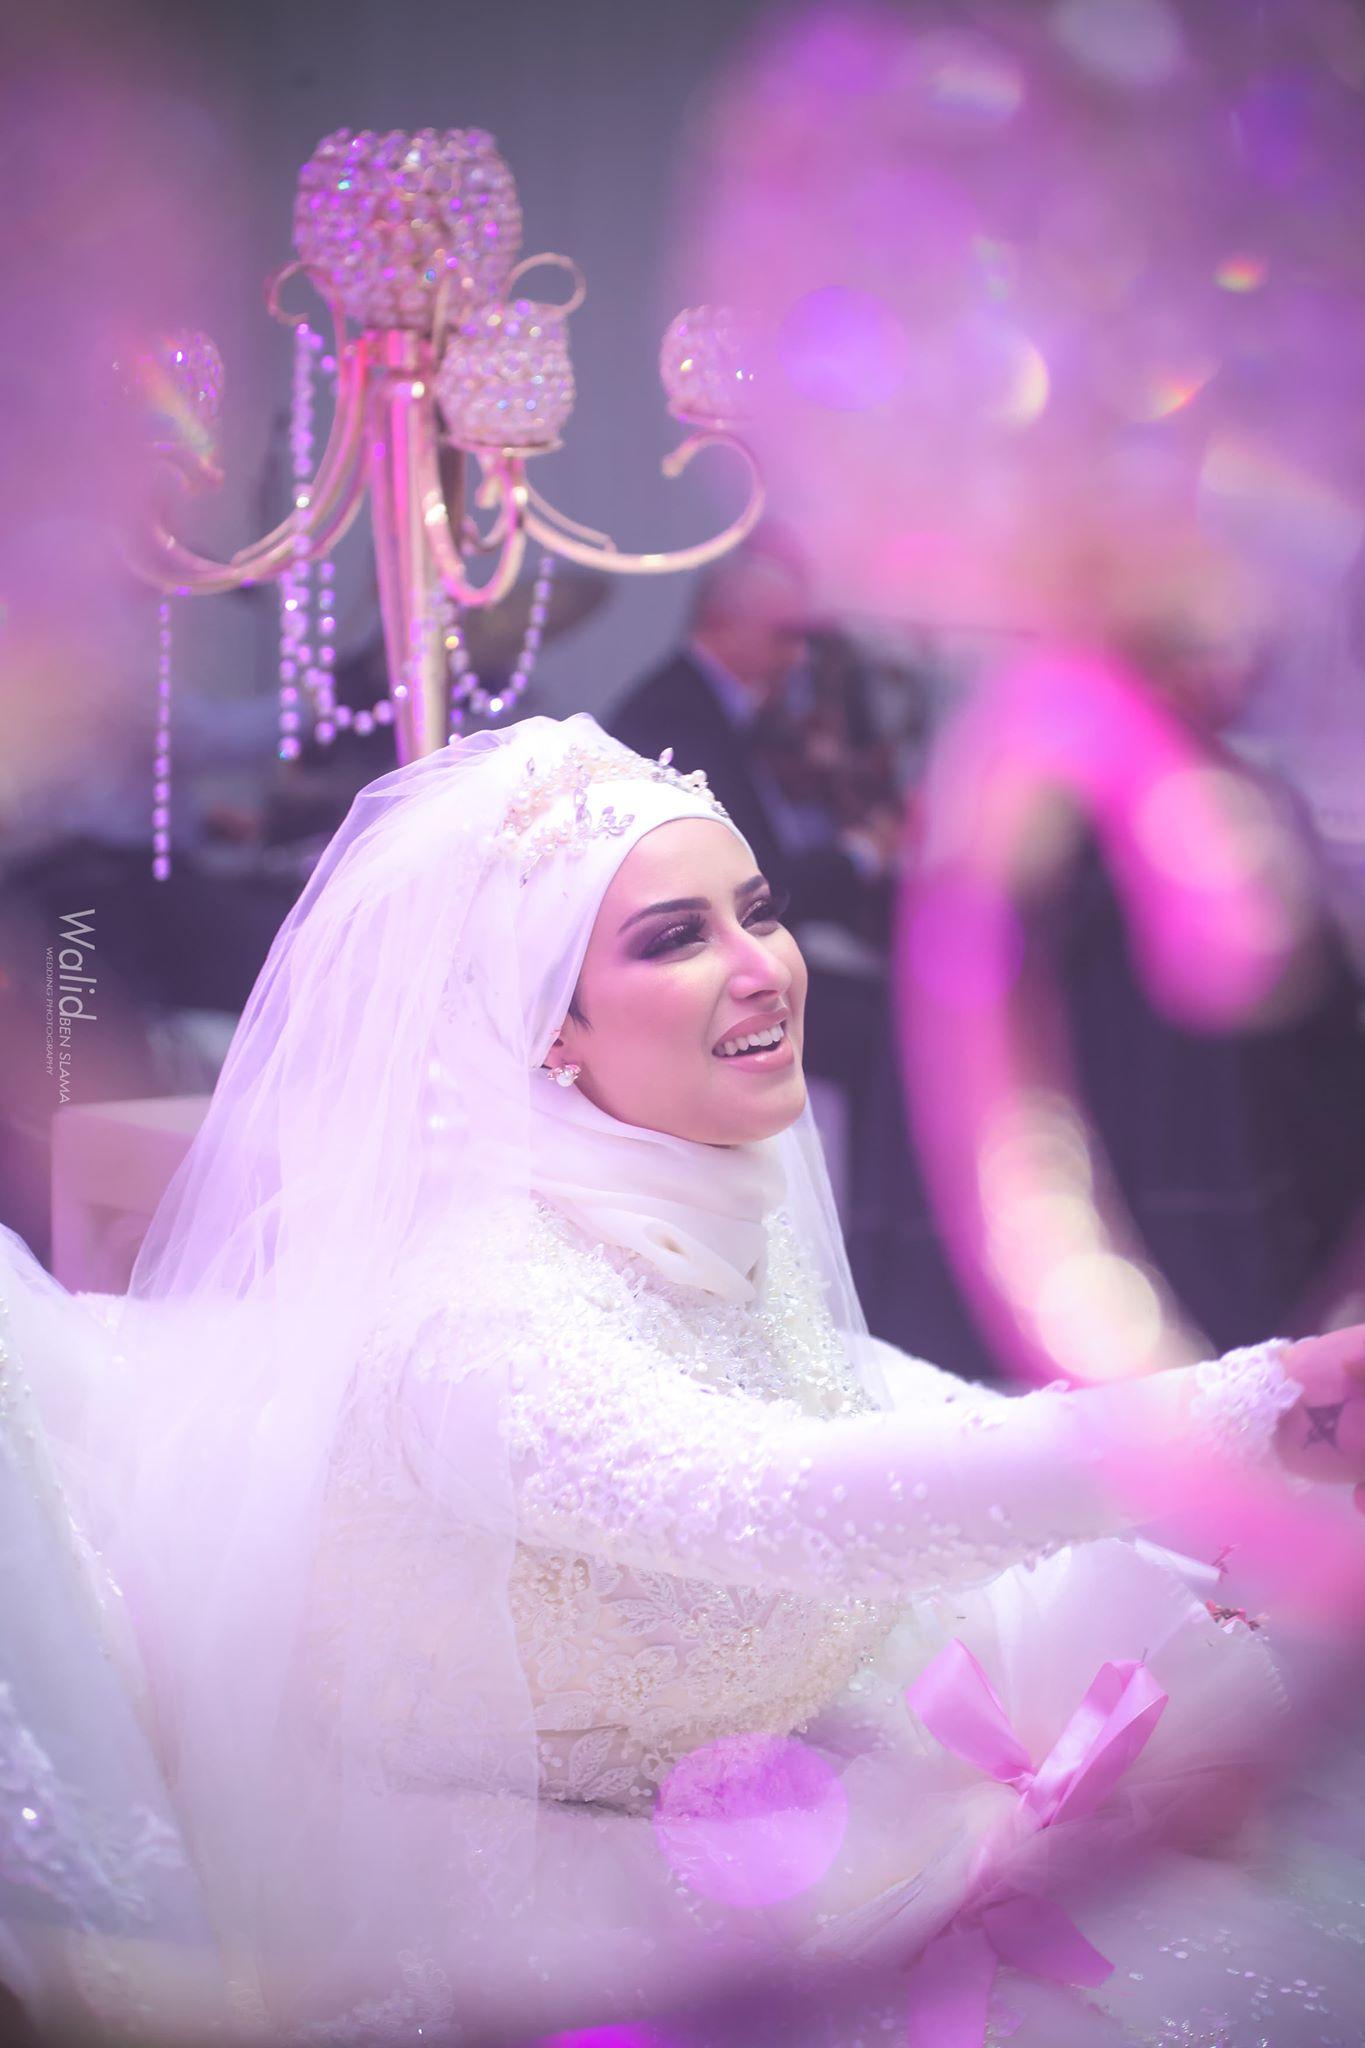 Tesnim_M1_plus_belles_mariées_tunisiennes2019